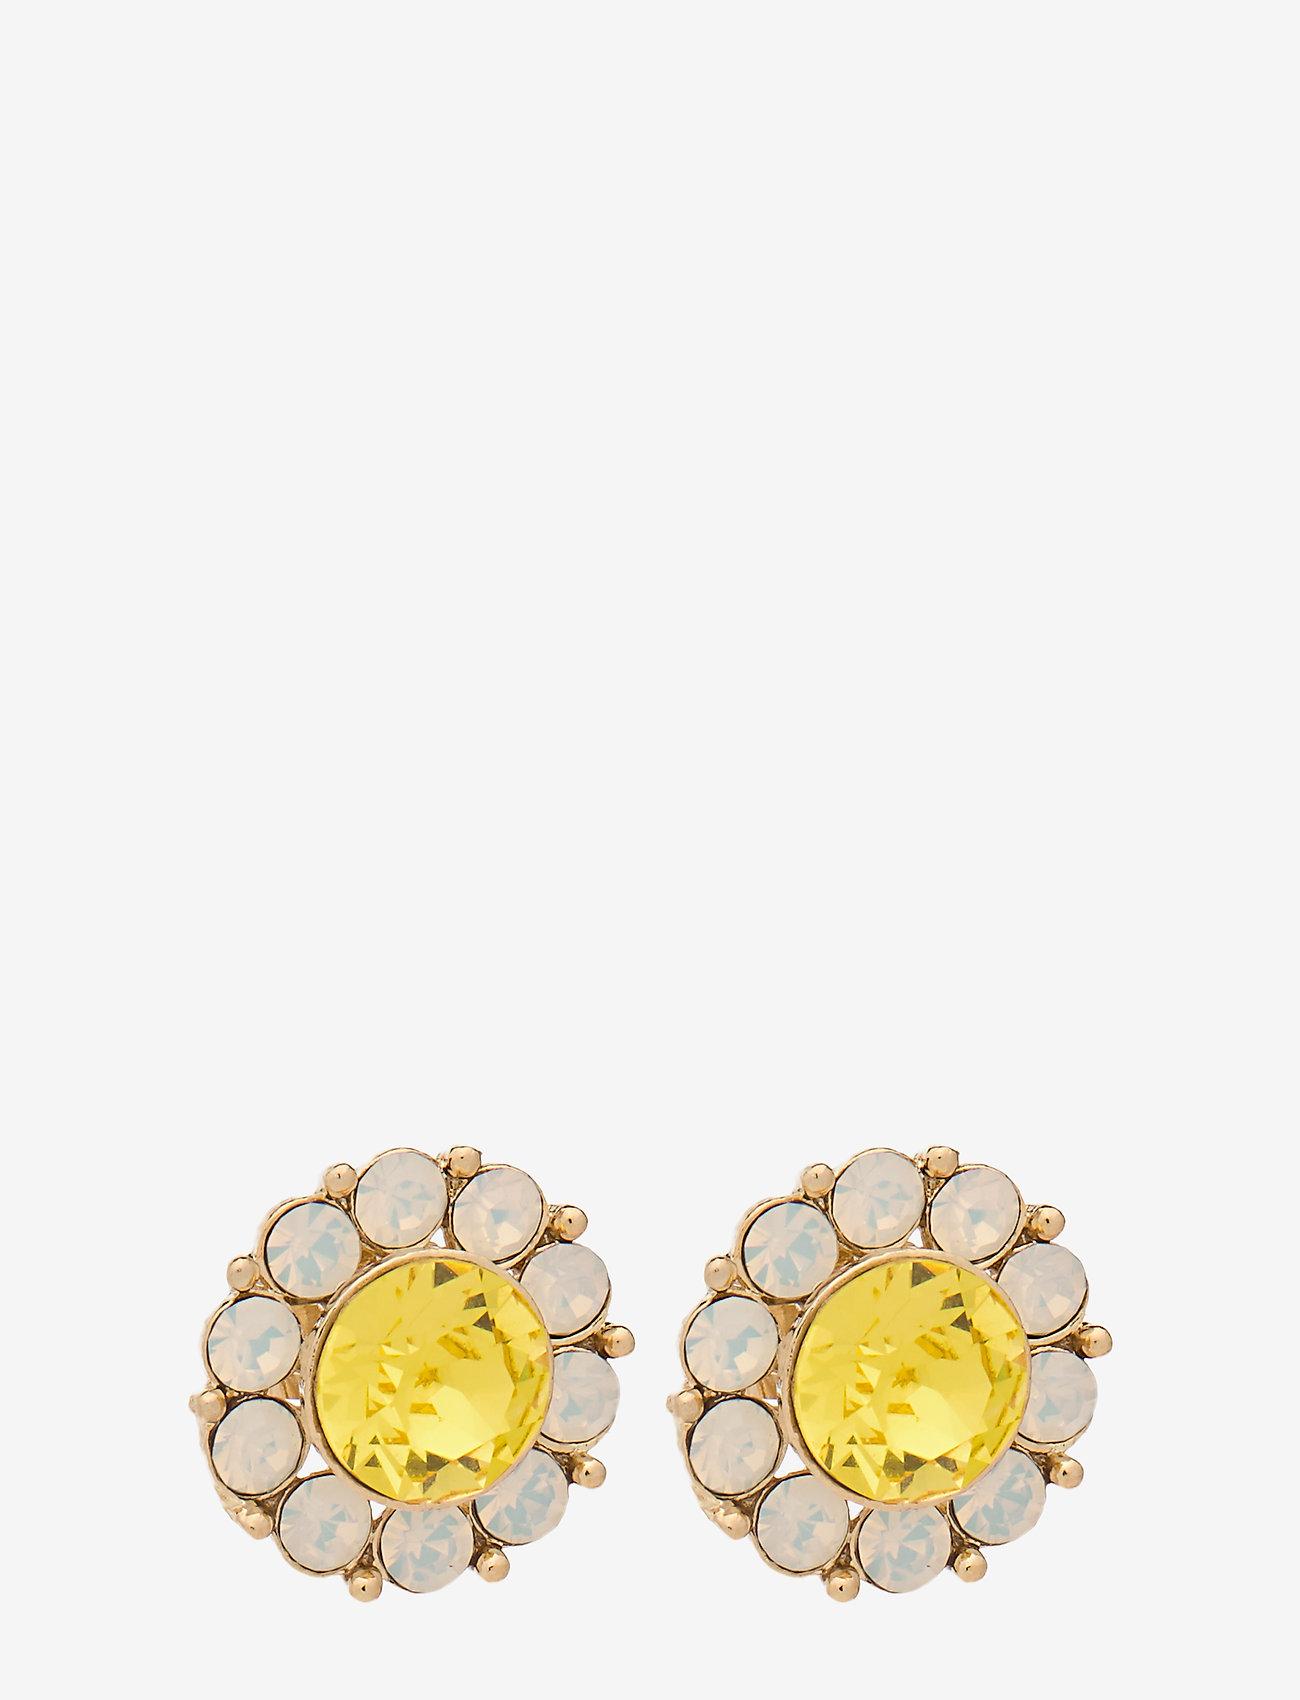 LILY AND ROSE - Miss Sofia earrings - Sunshine - nappikorvakorut - sunshine